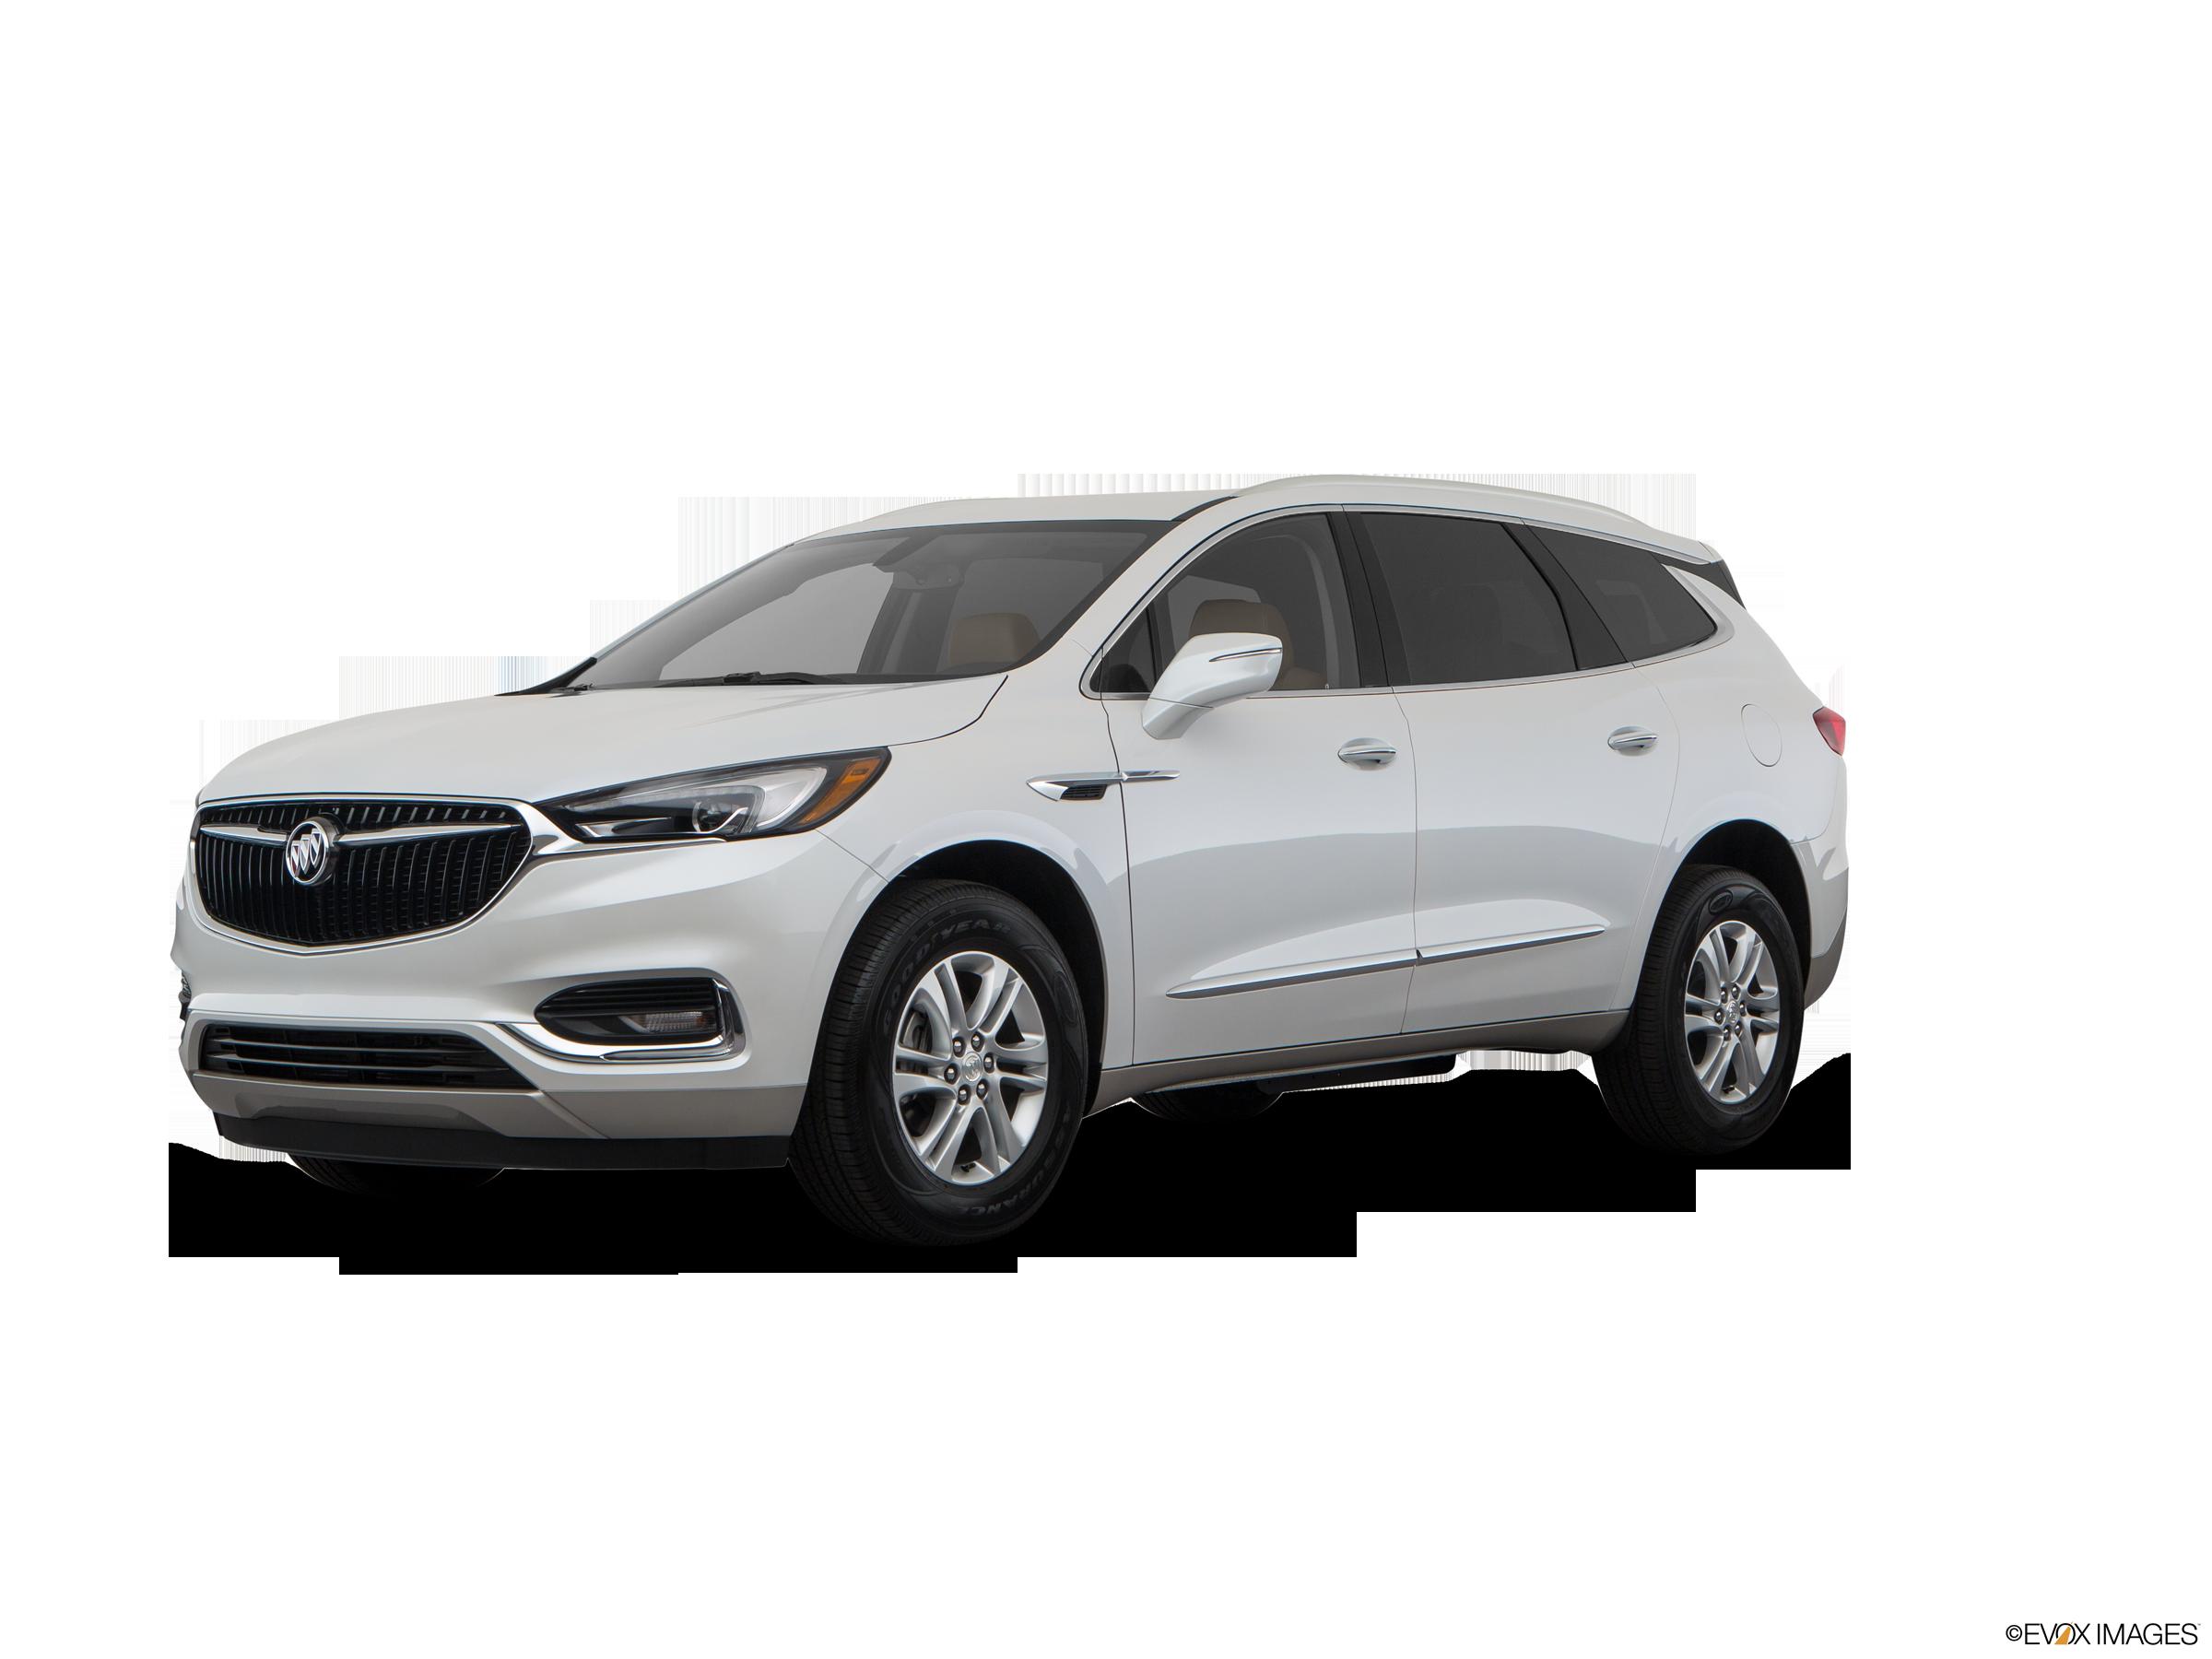 2018 Buick Enclave Pricing Reviews Ratings Kelley Blue Book